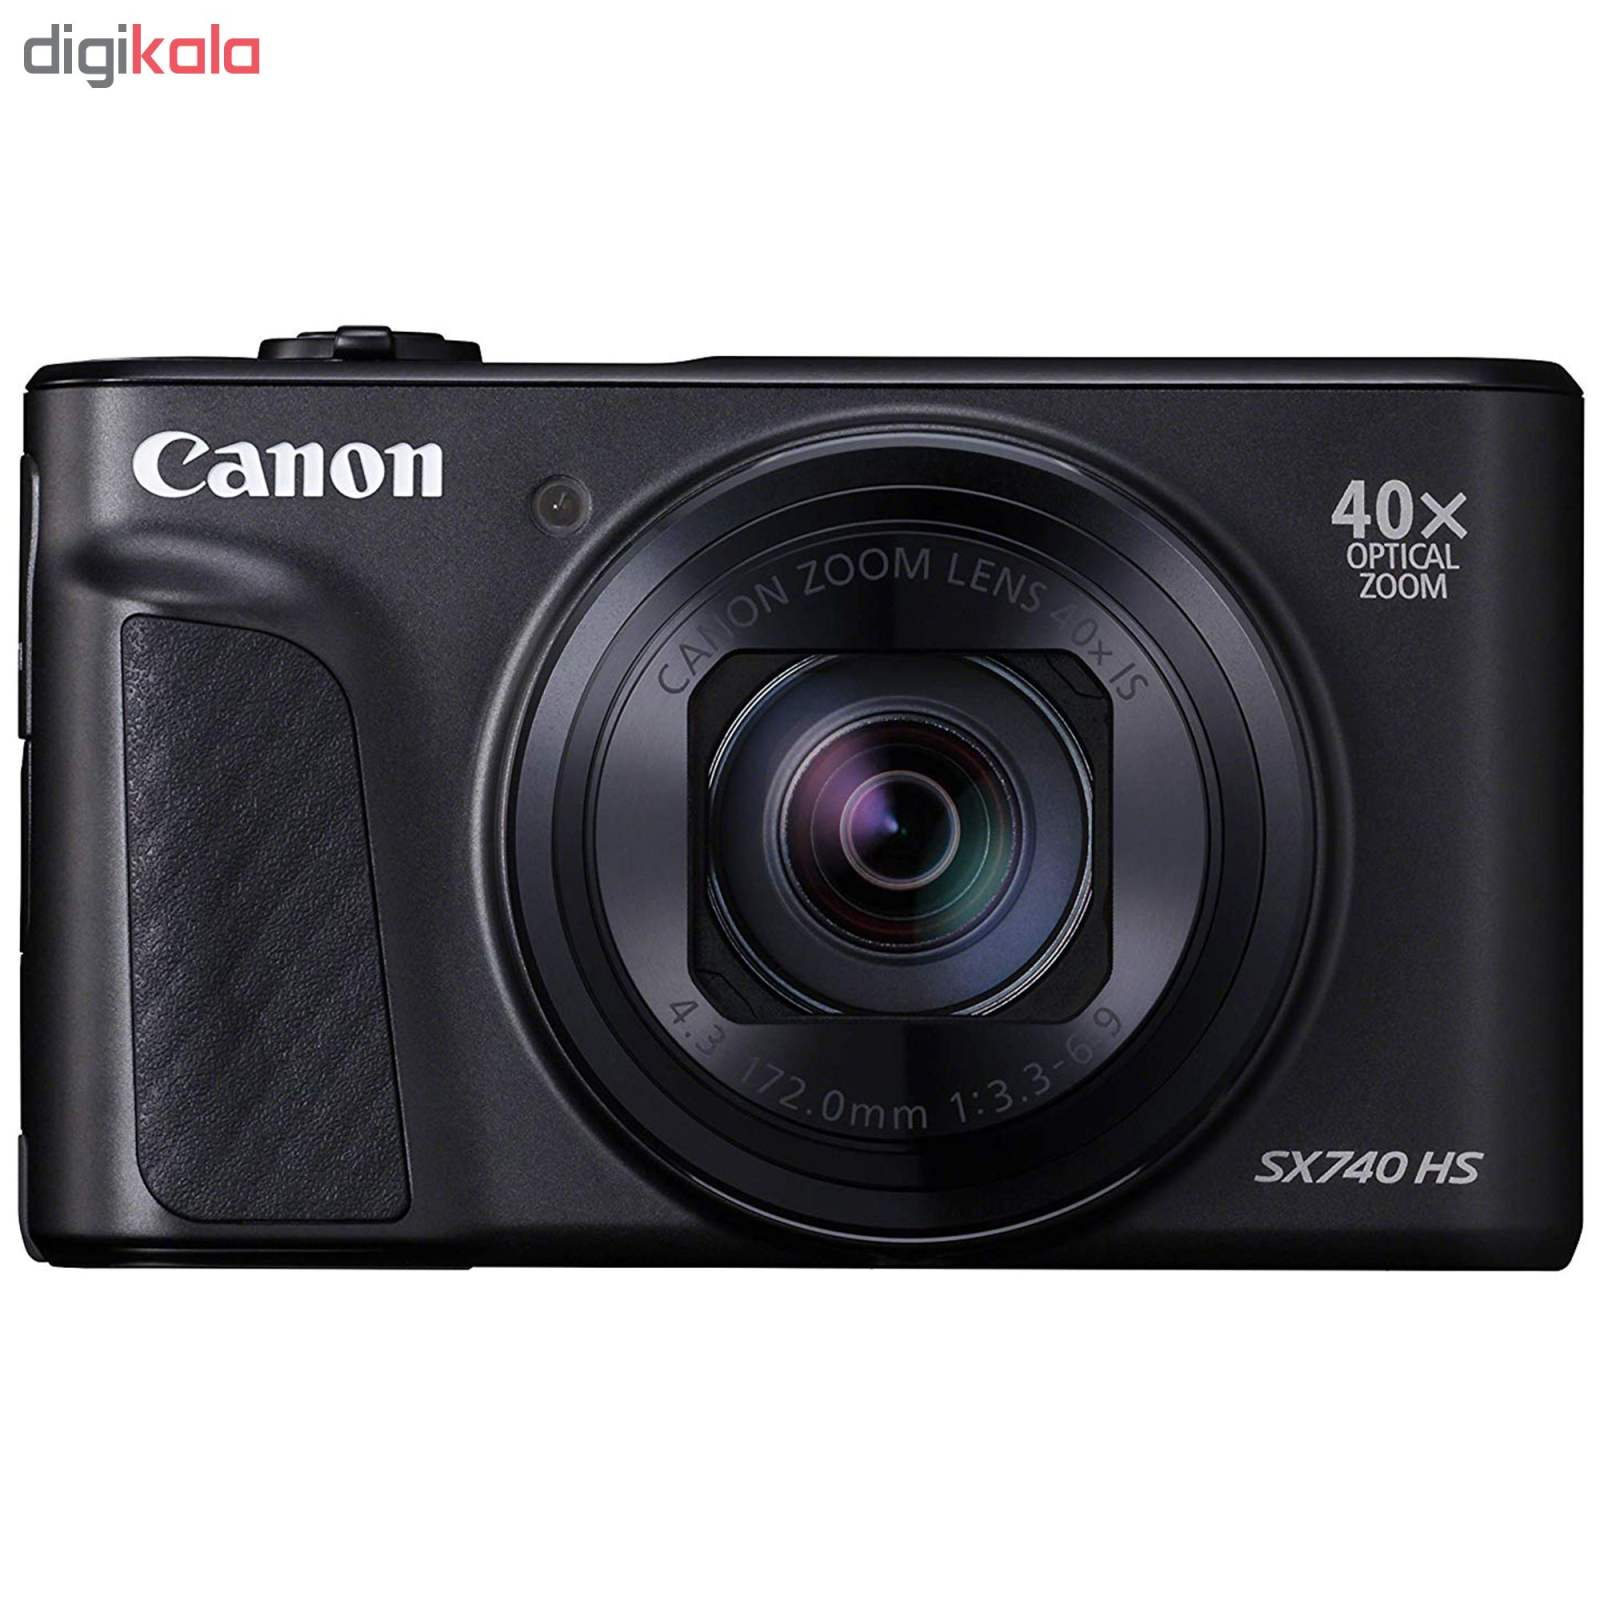 دوربین دیجیتال کانن مدل Powershot SX740 HS  Canon Powershot SX740 HS Digital Camera